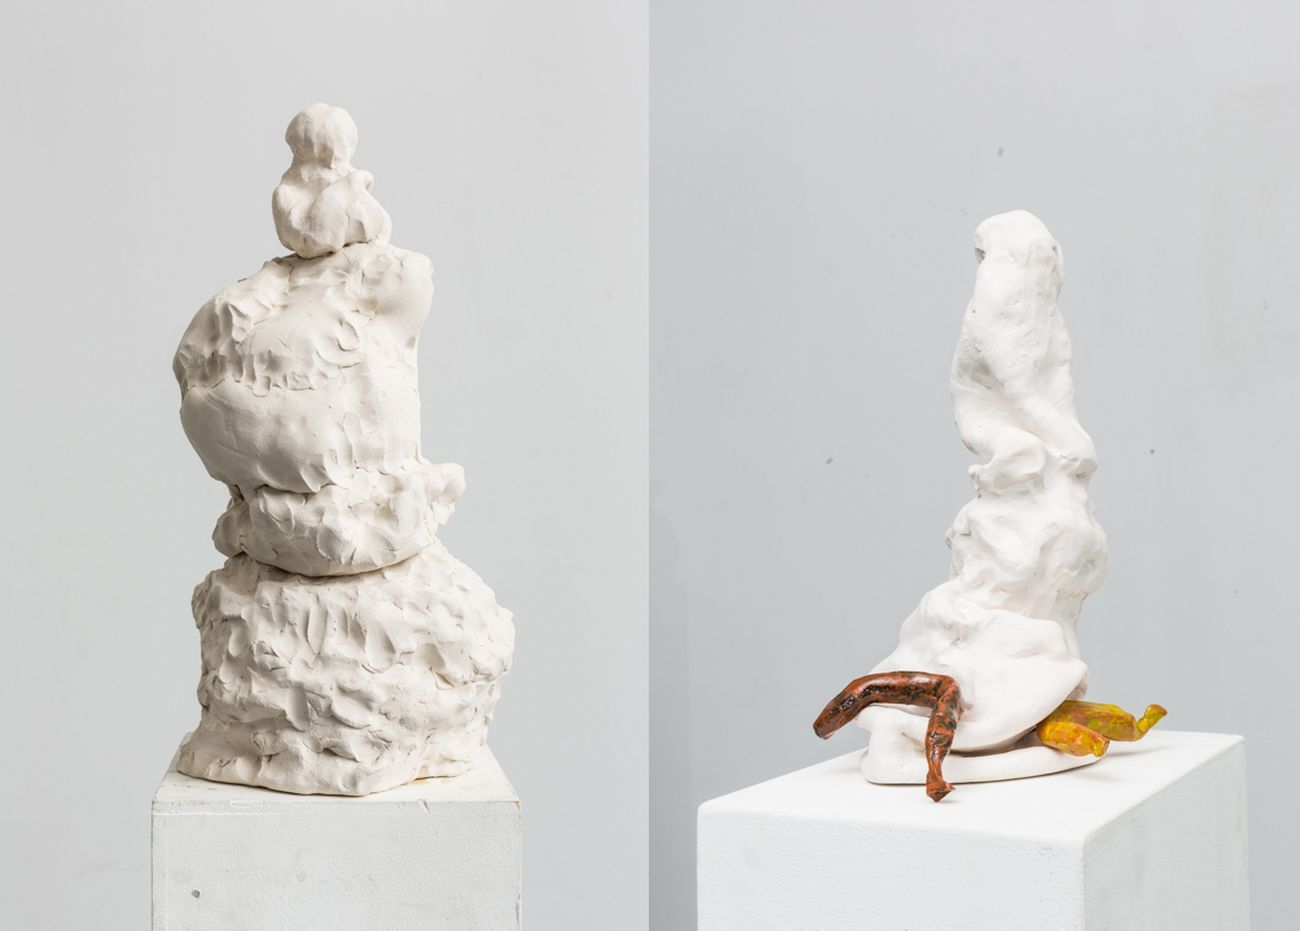 Lorenza Boisi, Ceramica, 2014